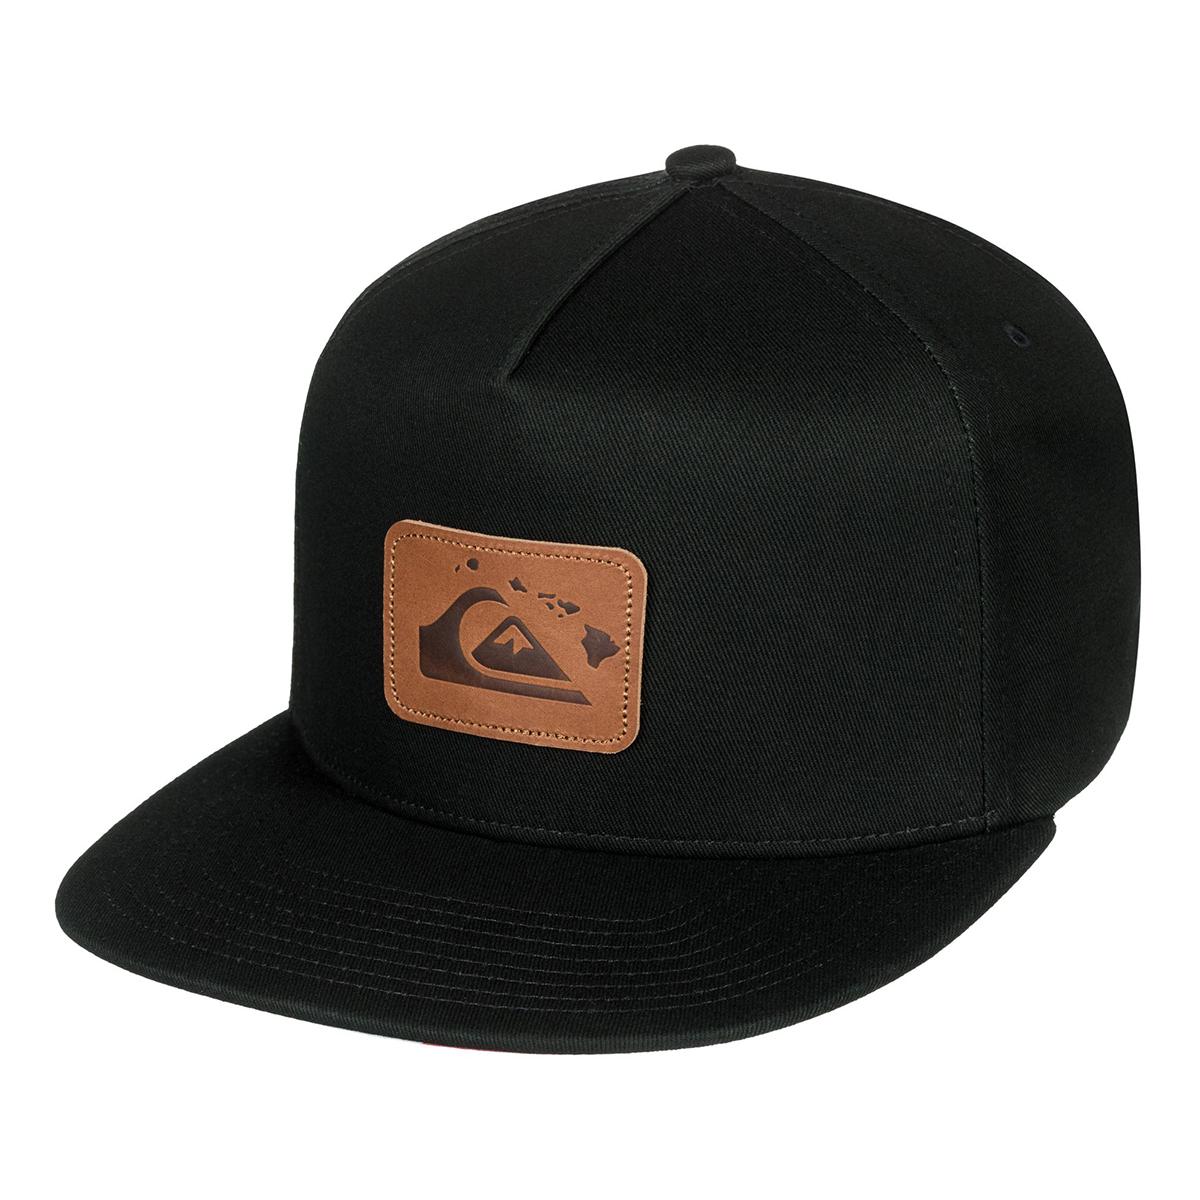 Quiksilver Men s Outriggin Snapback Hat Anthracite 889351442888  776c63843ca8